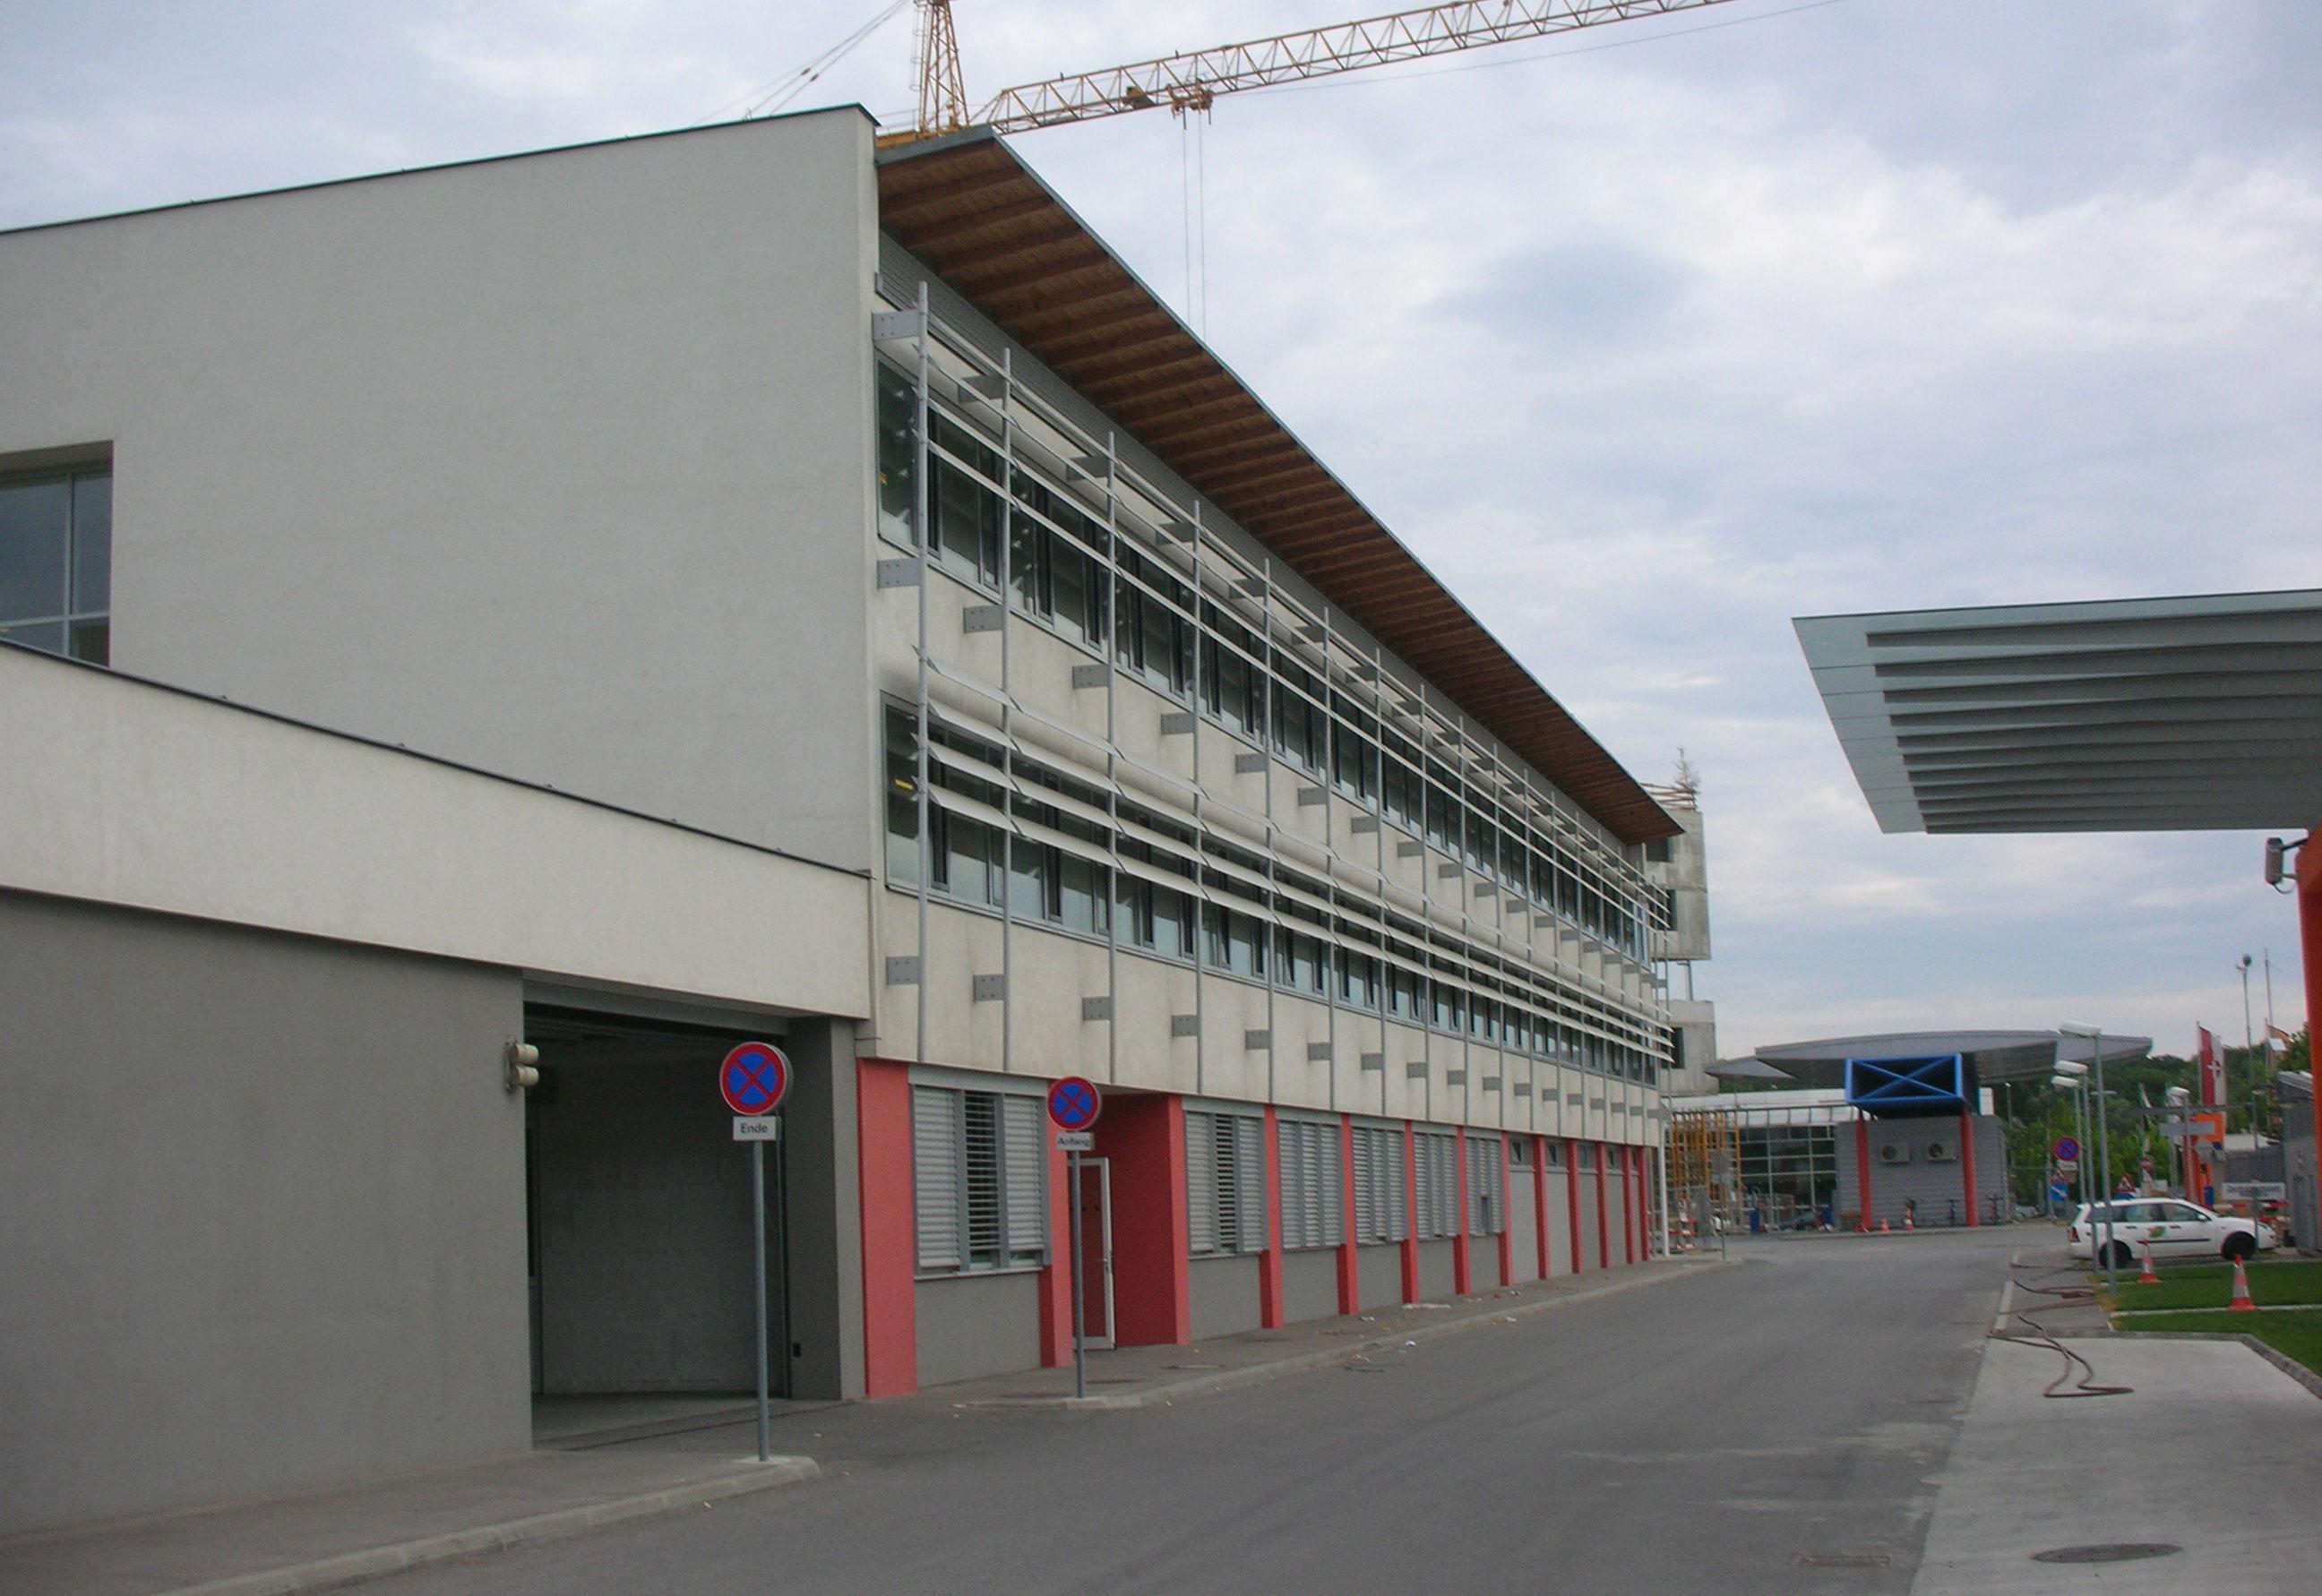 WienenergieGasnetzWeb